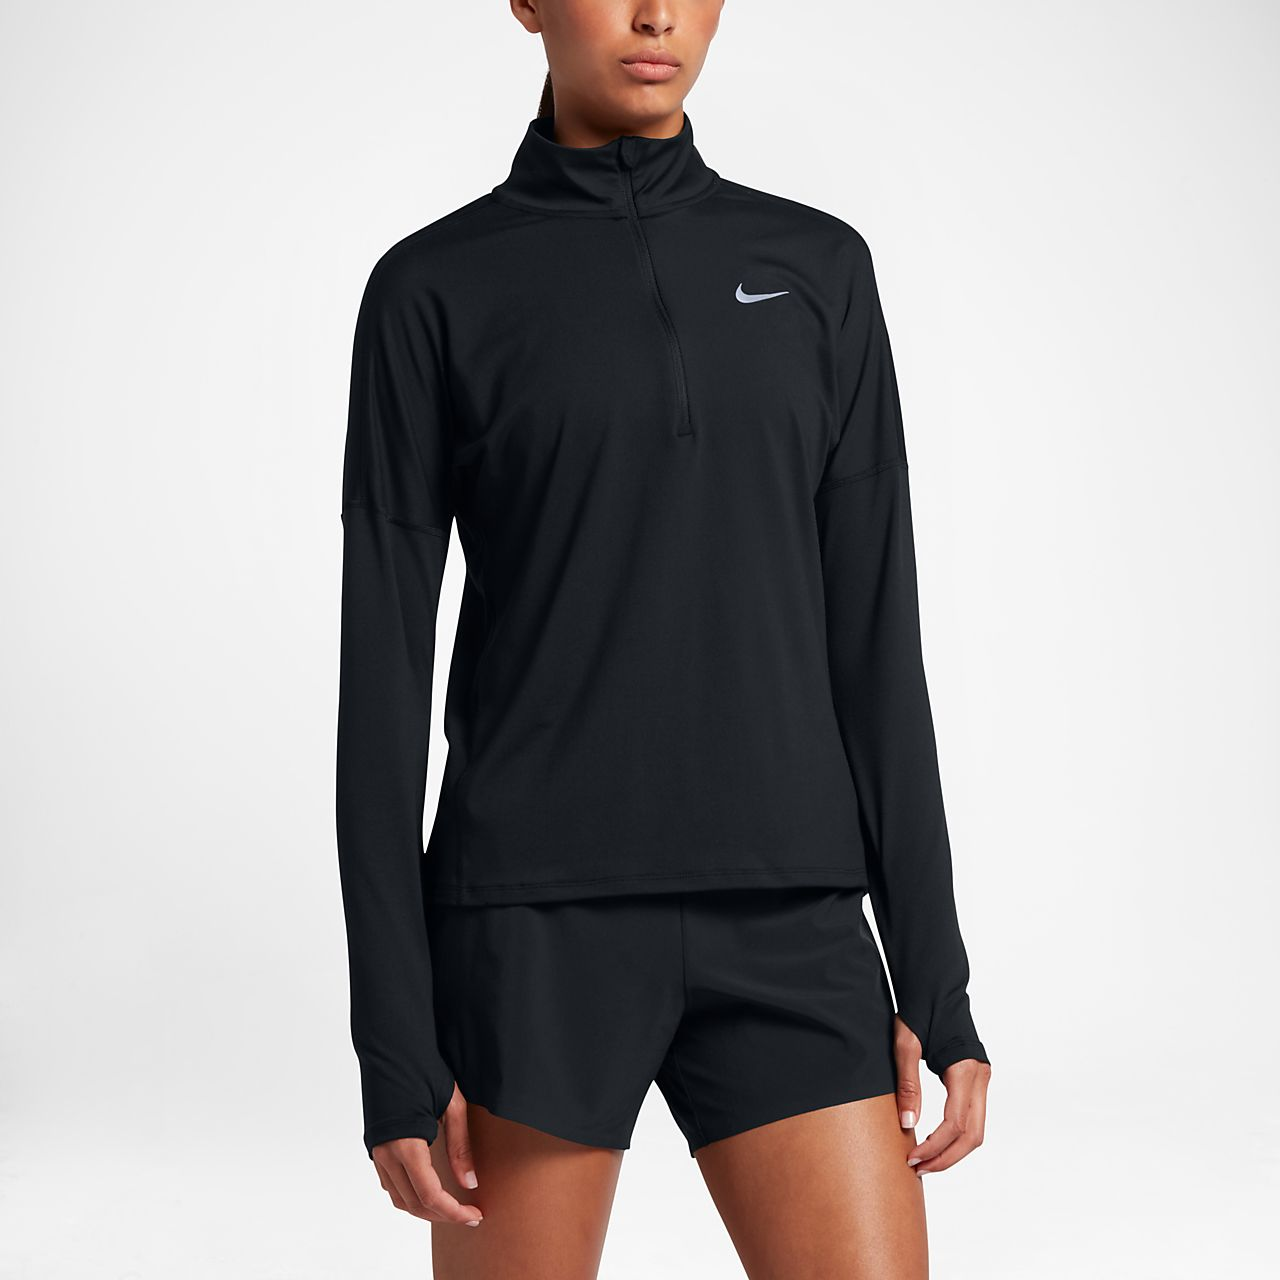 21e8d05ee881 Nike Dri-FIT Element Women s Long-Sleeve Running Half-Zip Top. Nike ...